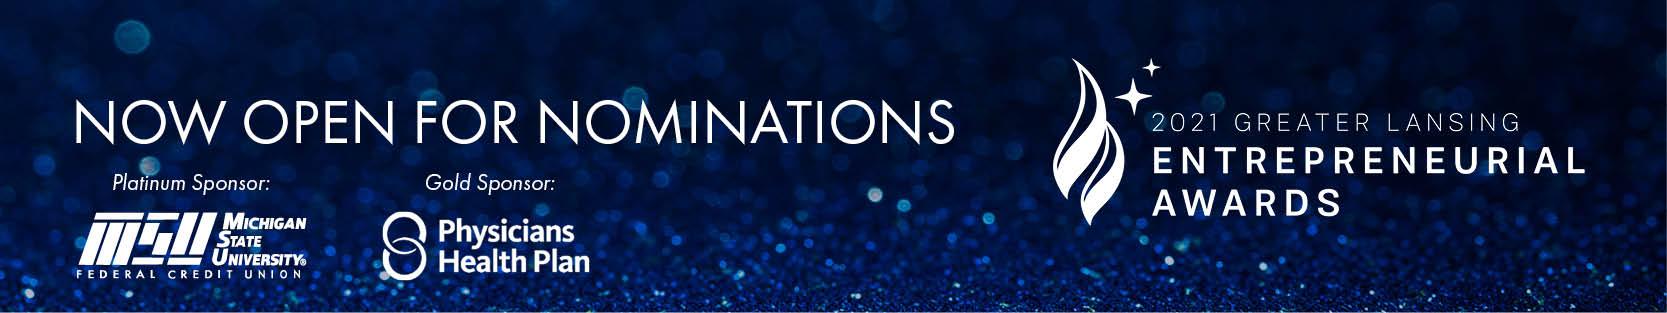 2021 Entrepreneurial Awards